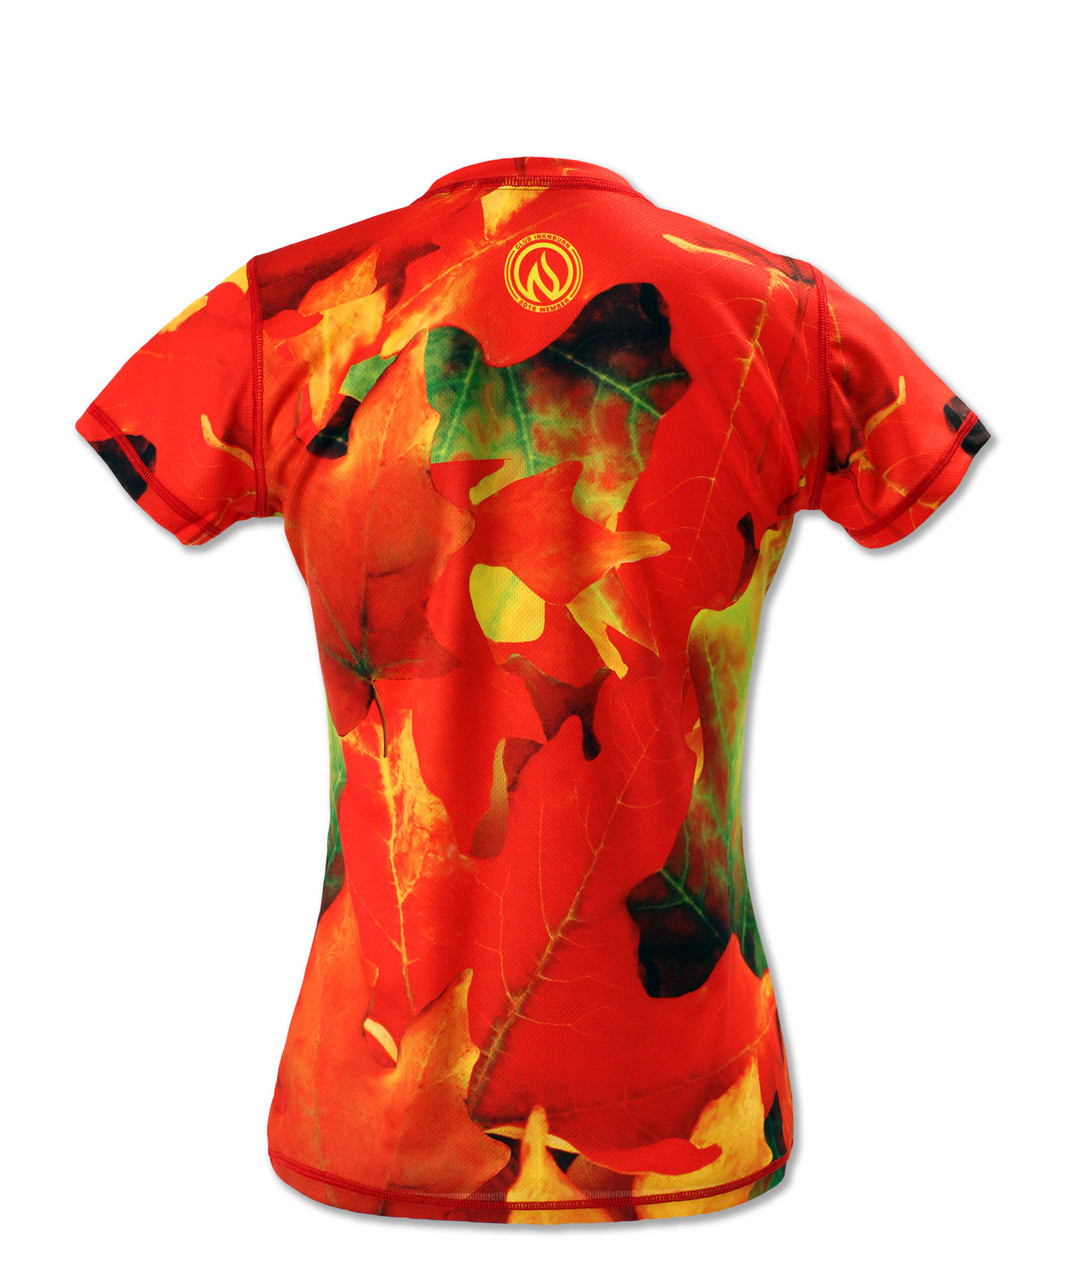 INKnBURN Women's Club INB Fall Tech Shirt Back